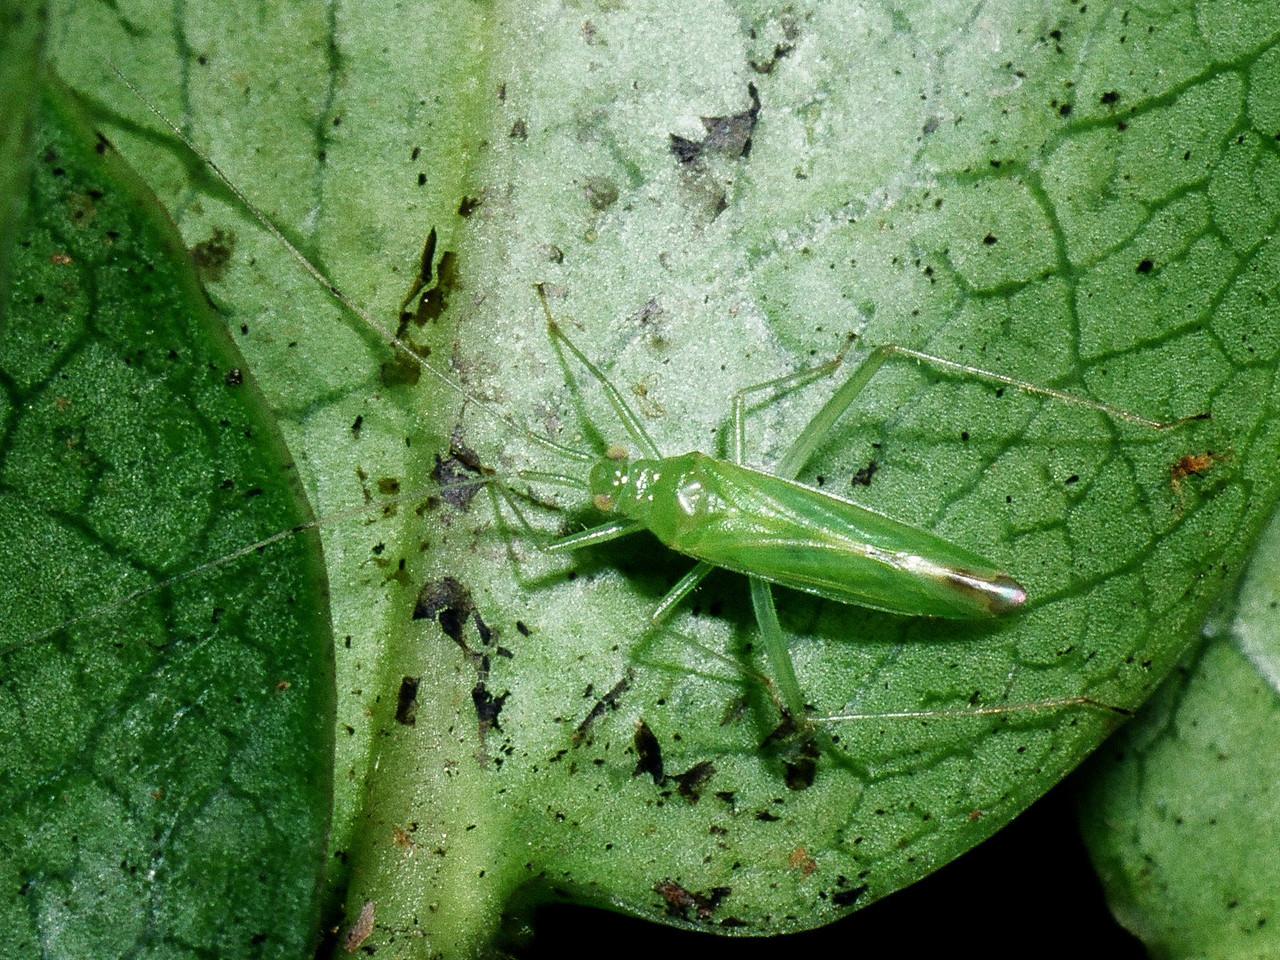 Nesiomiris hawaiiensis (Miridae) on Ilex anomala, Big Island